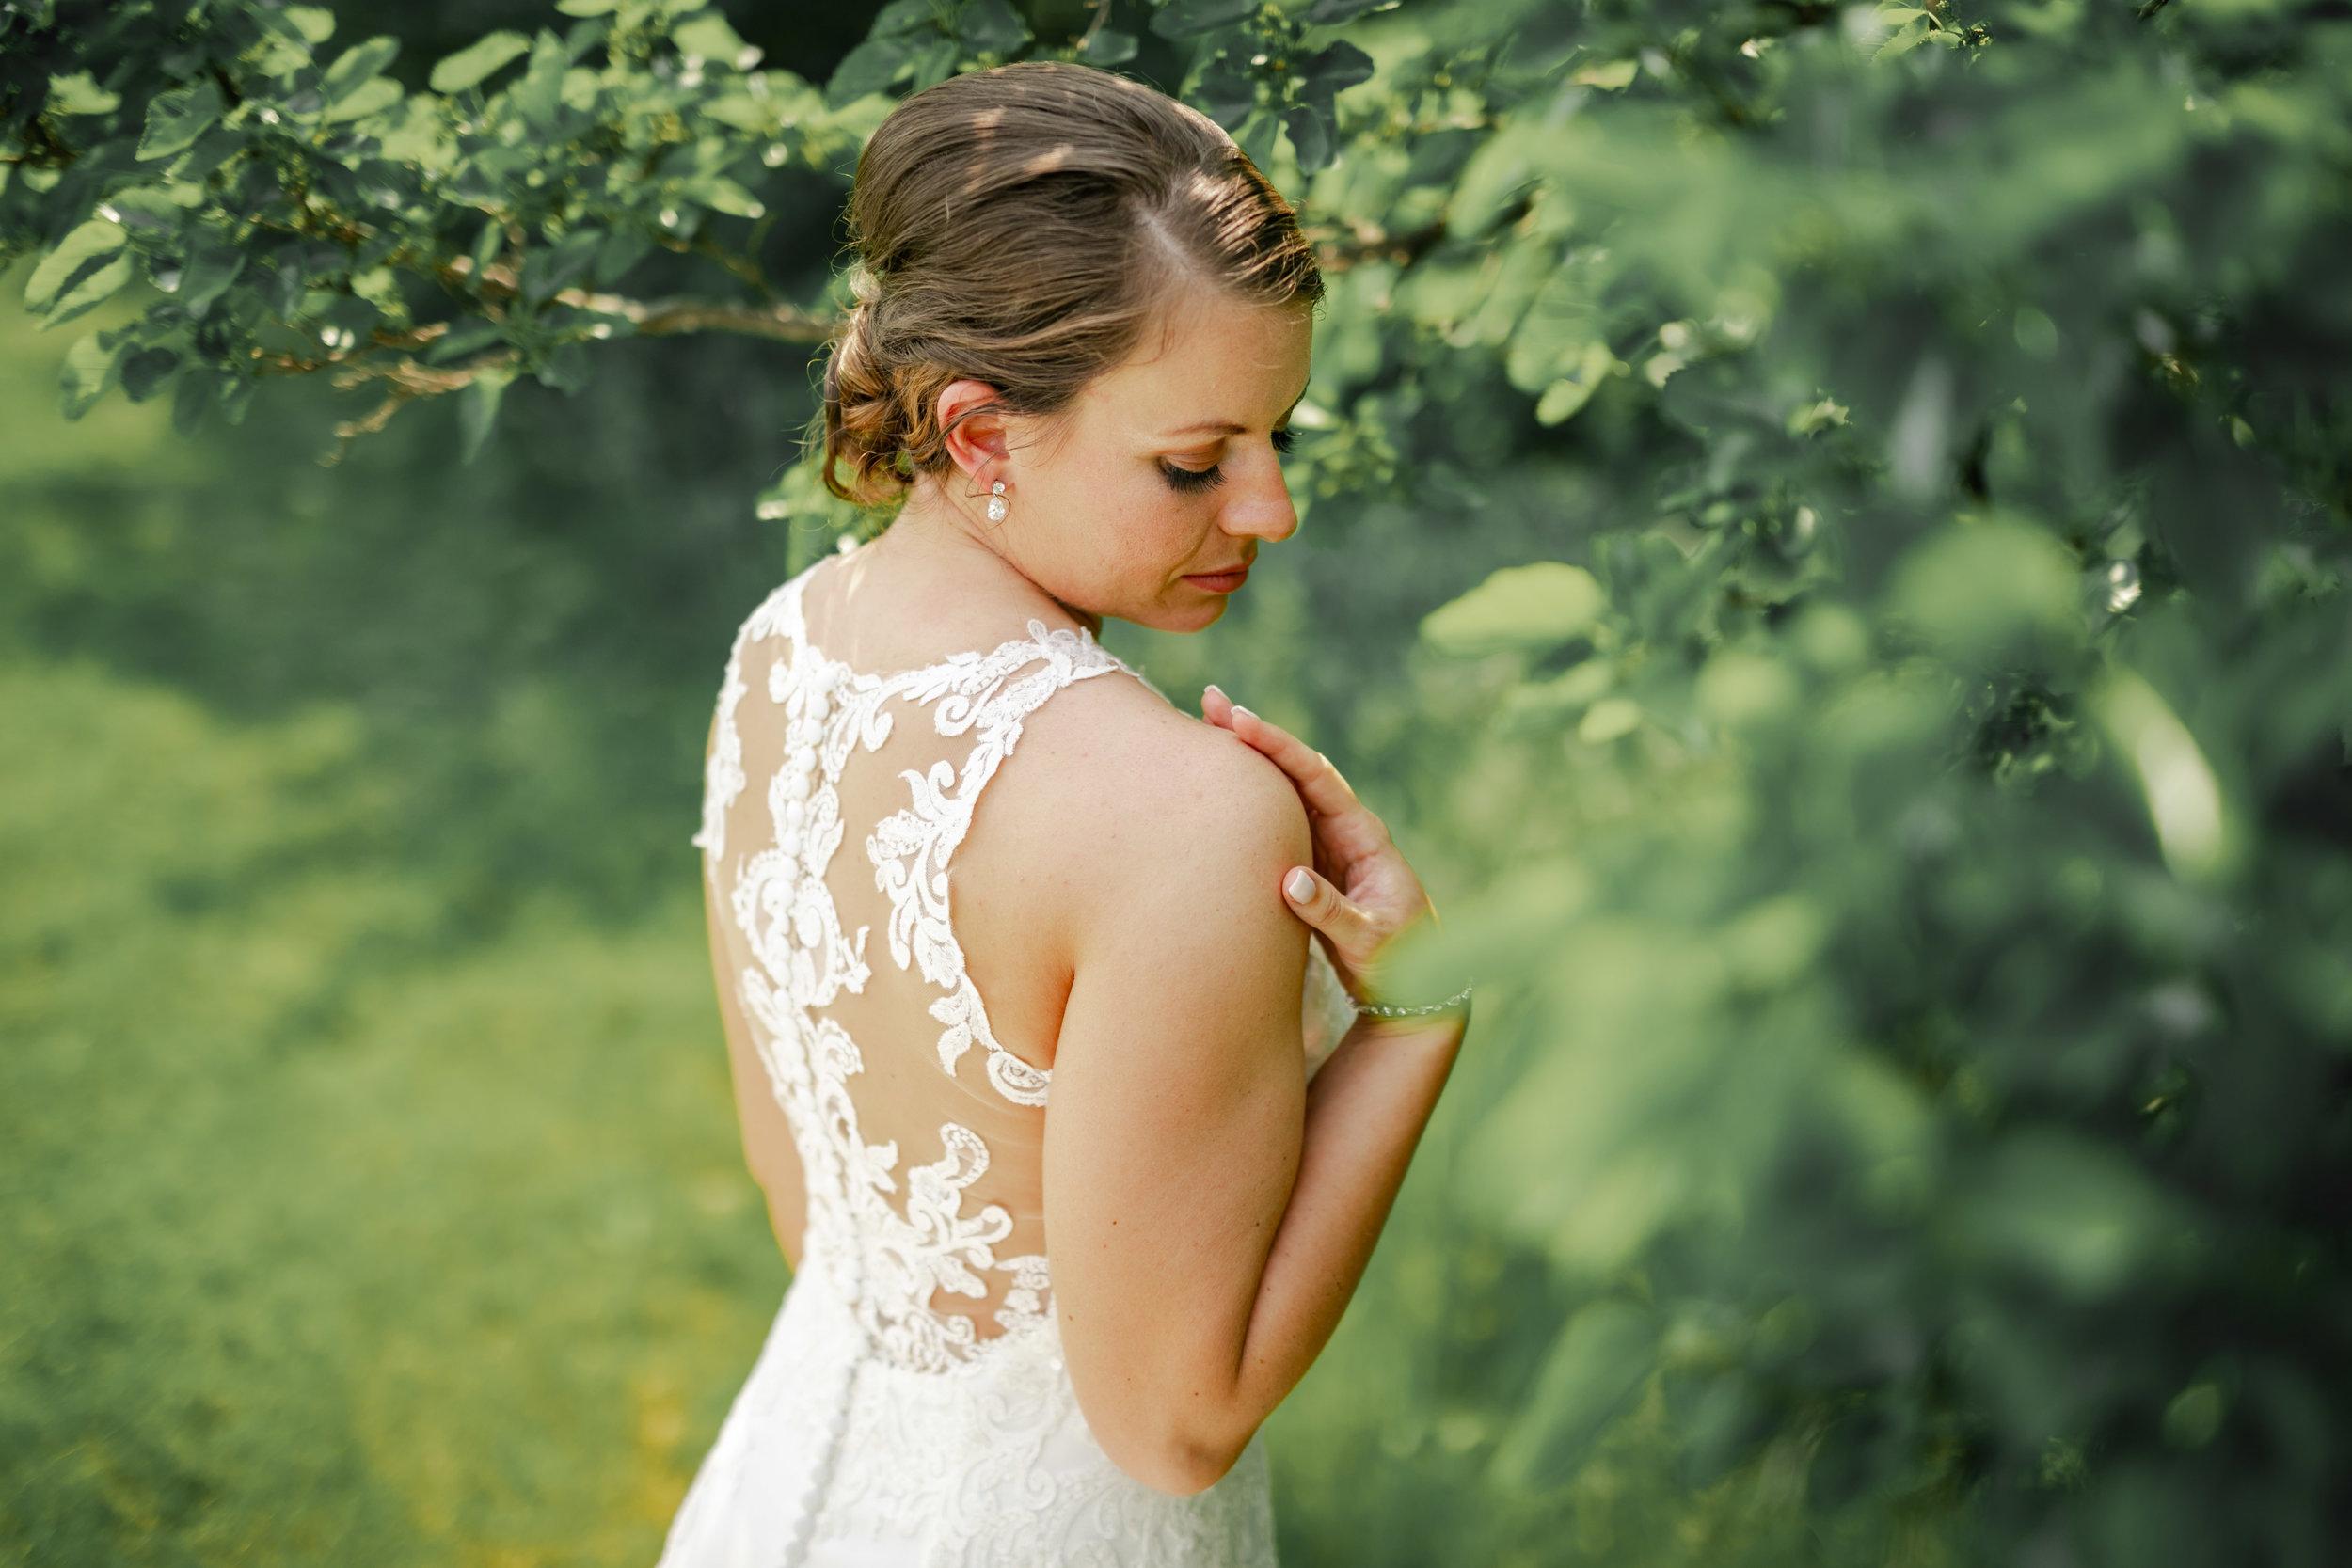 silver-lake-orland-park-wedding9.jpg